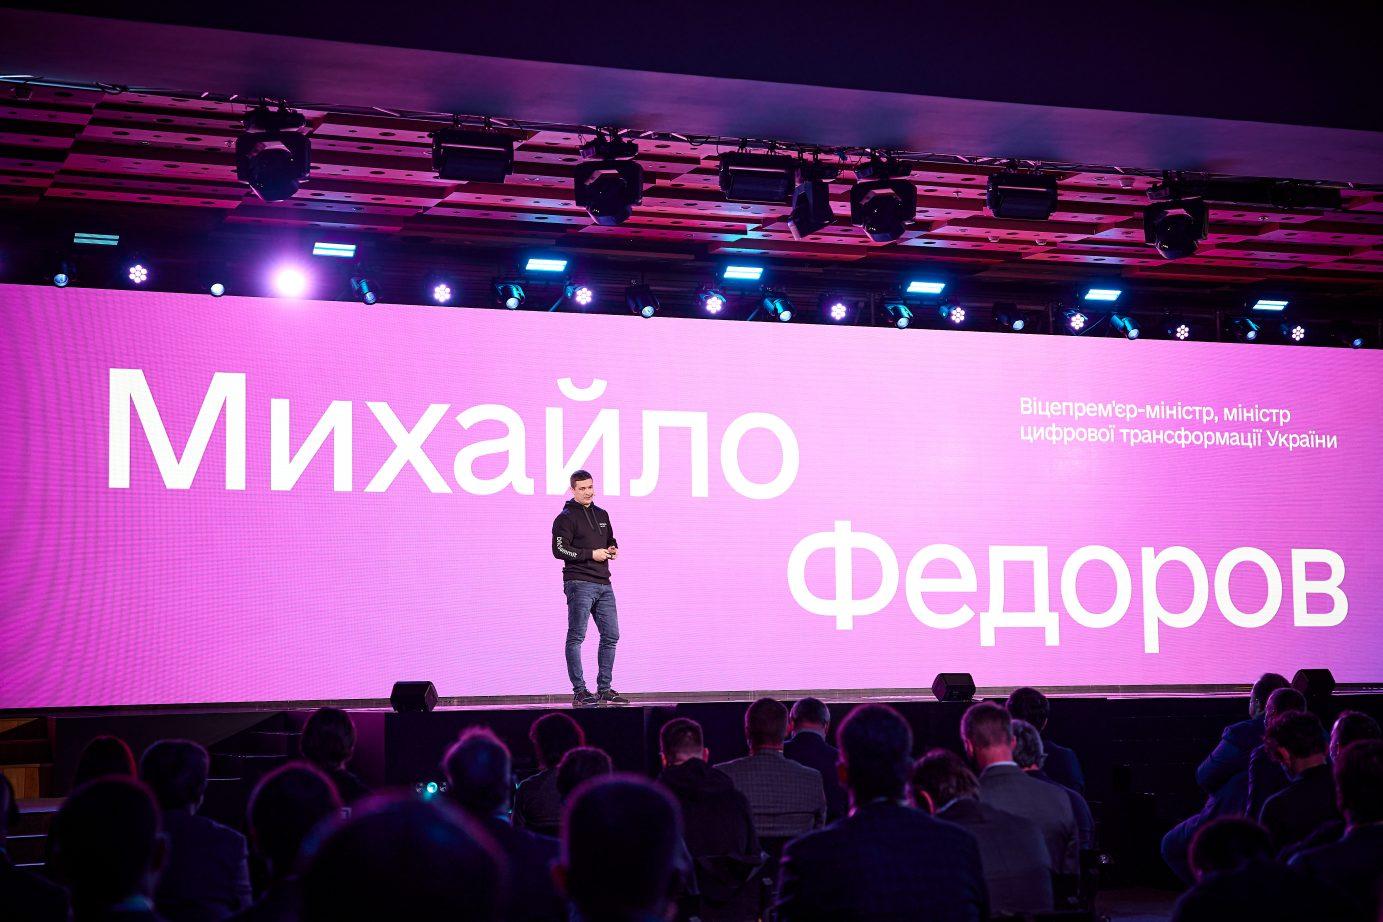 Ukraine's Minister of Digital Transformation Mykhailo Fedorov